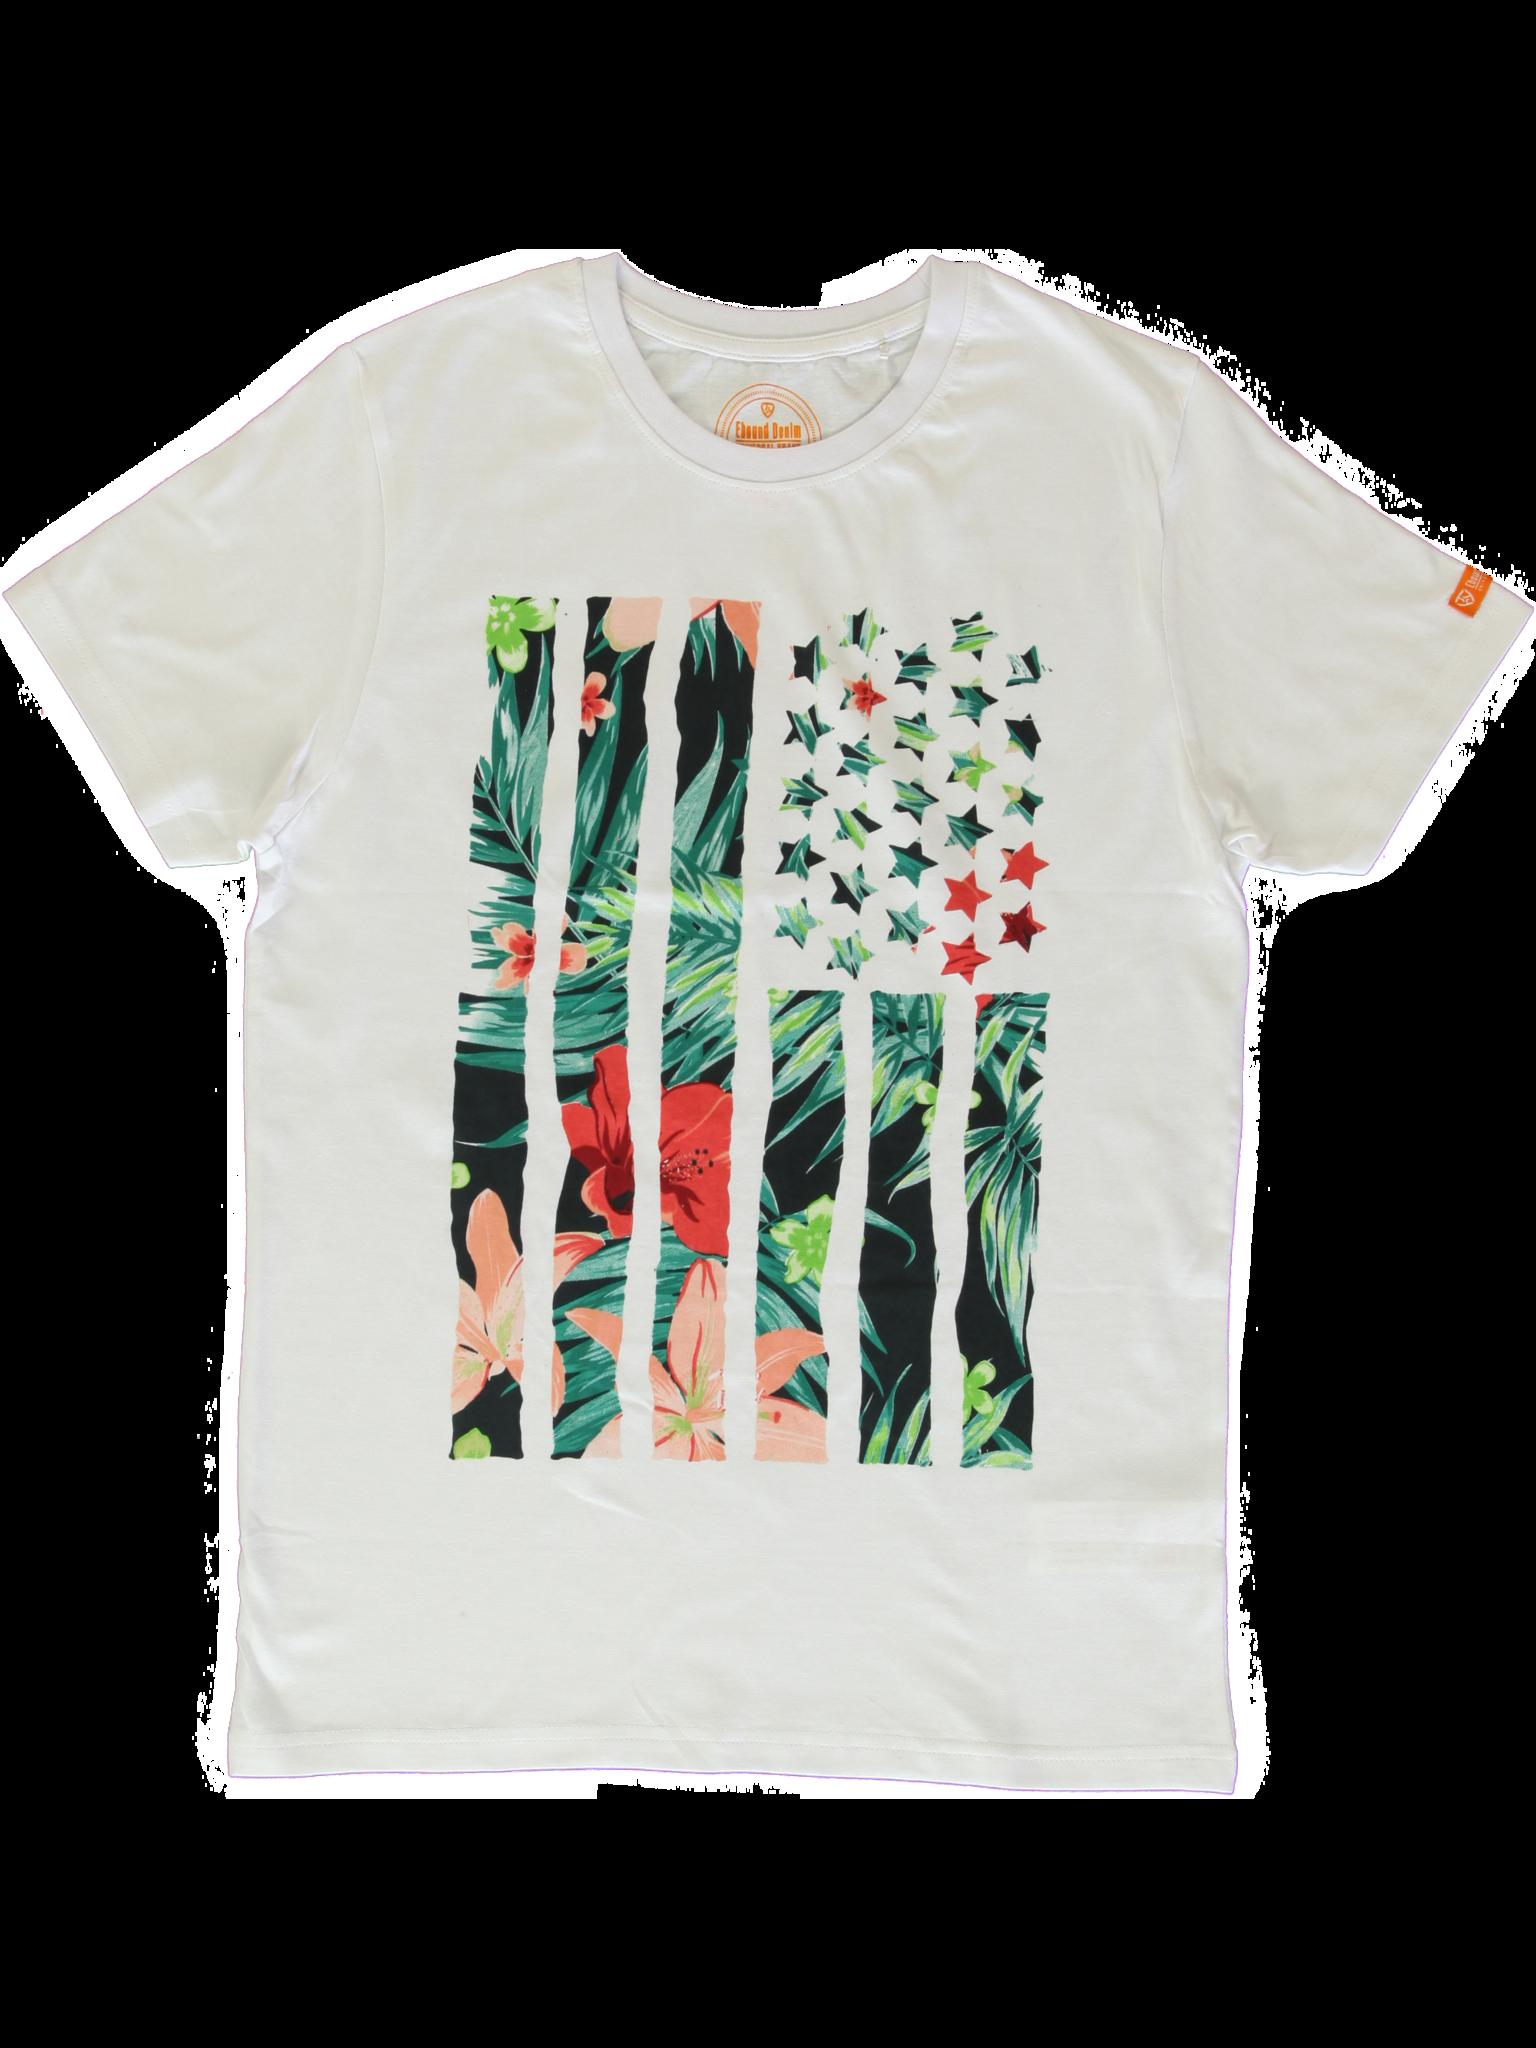 All Brands | Summerproducts Men | T-shirt | 18 pcs/box